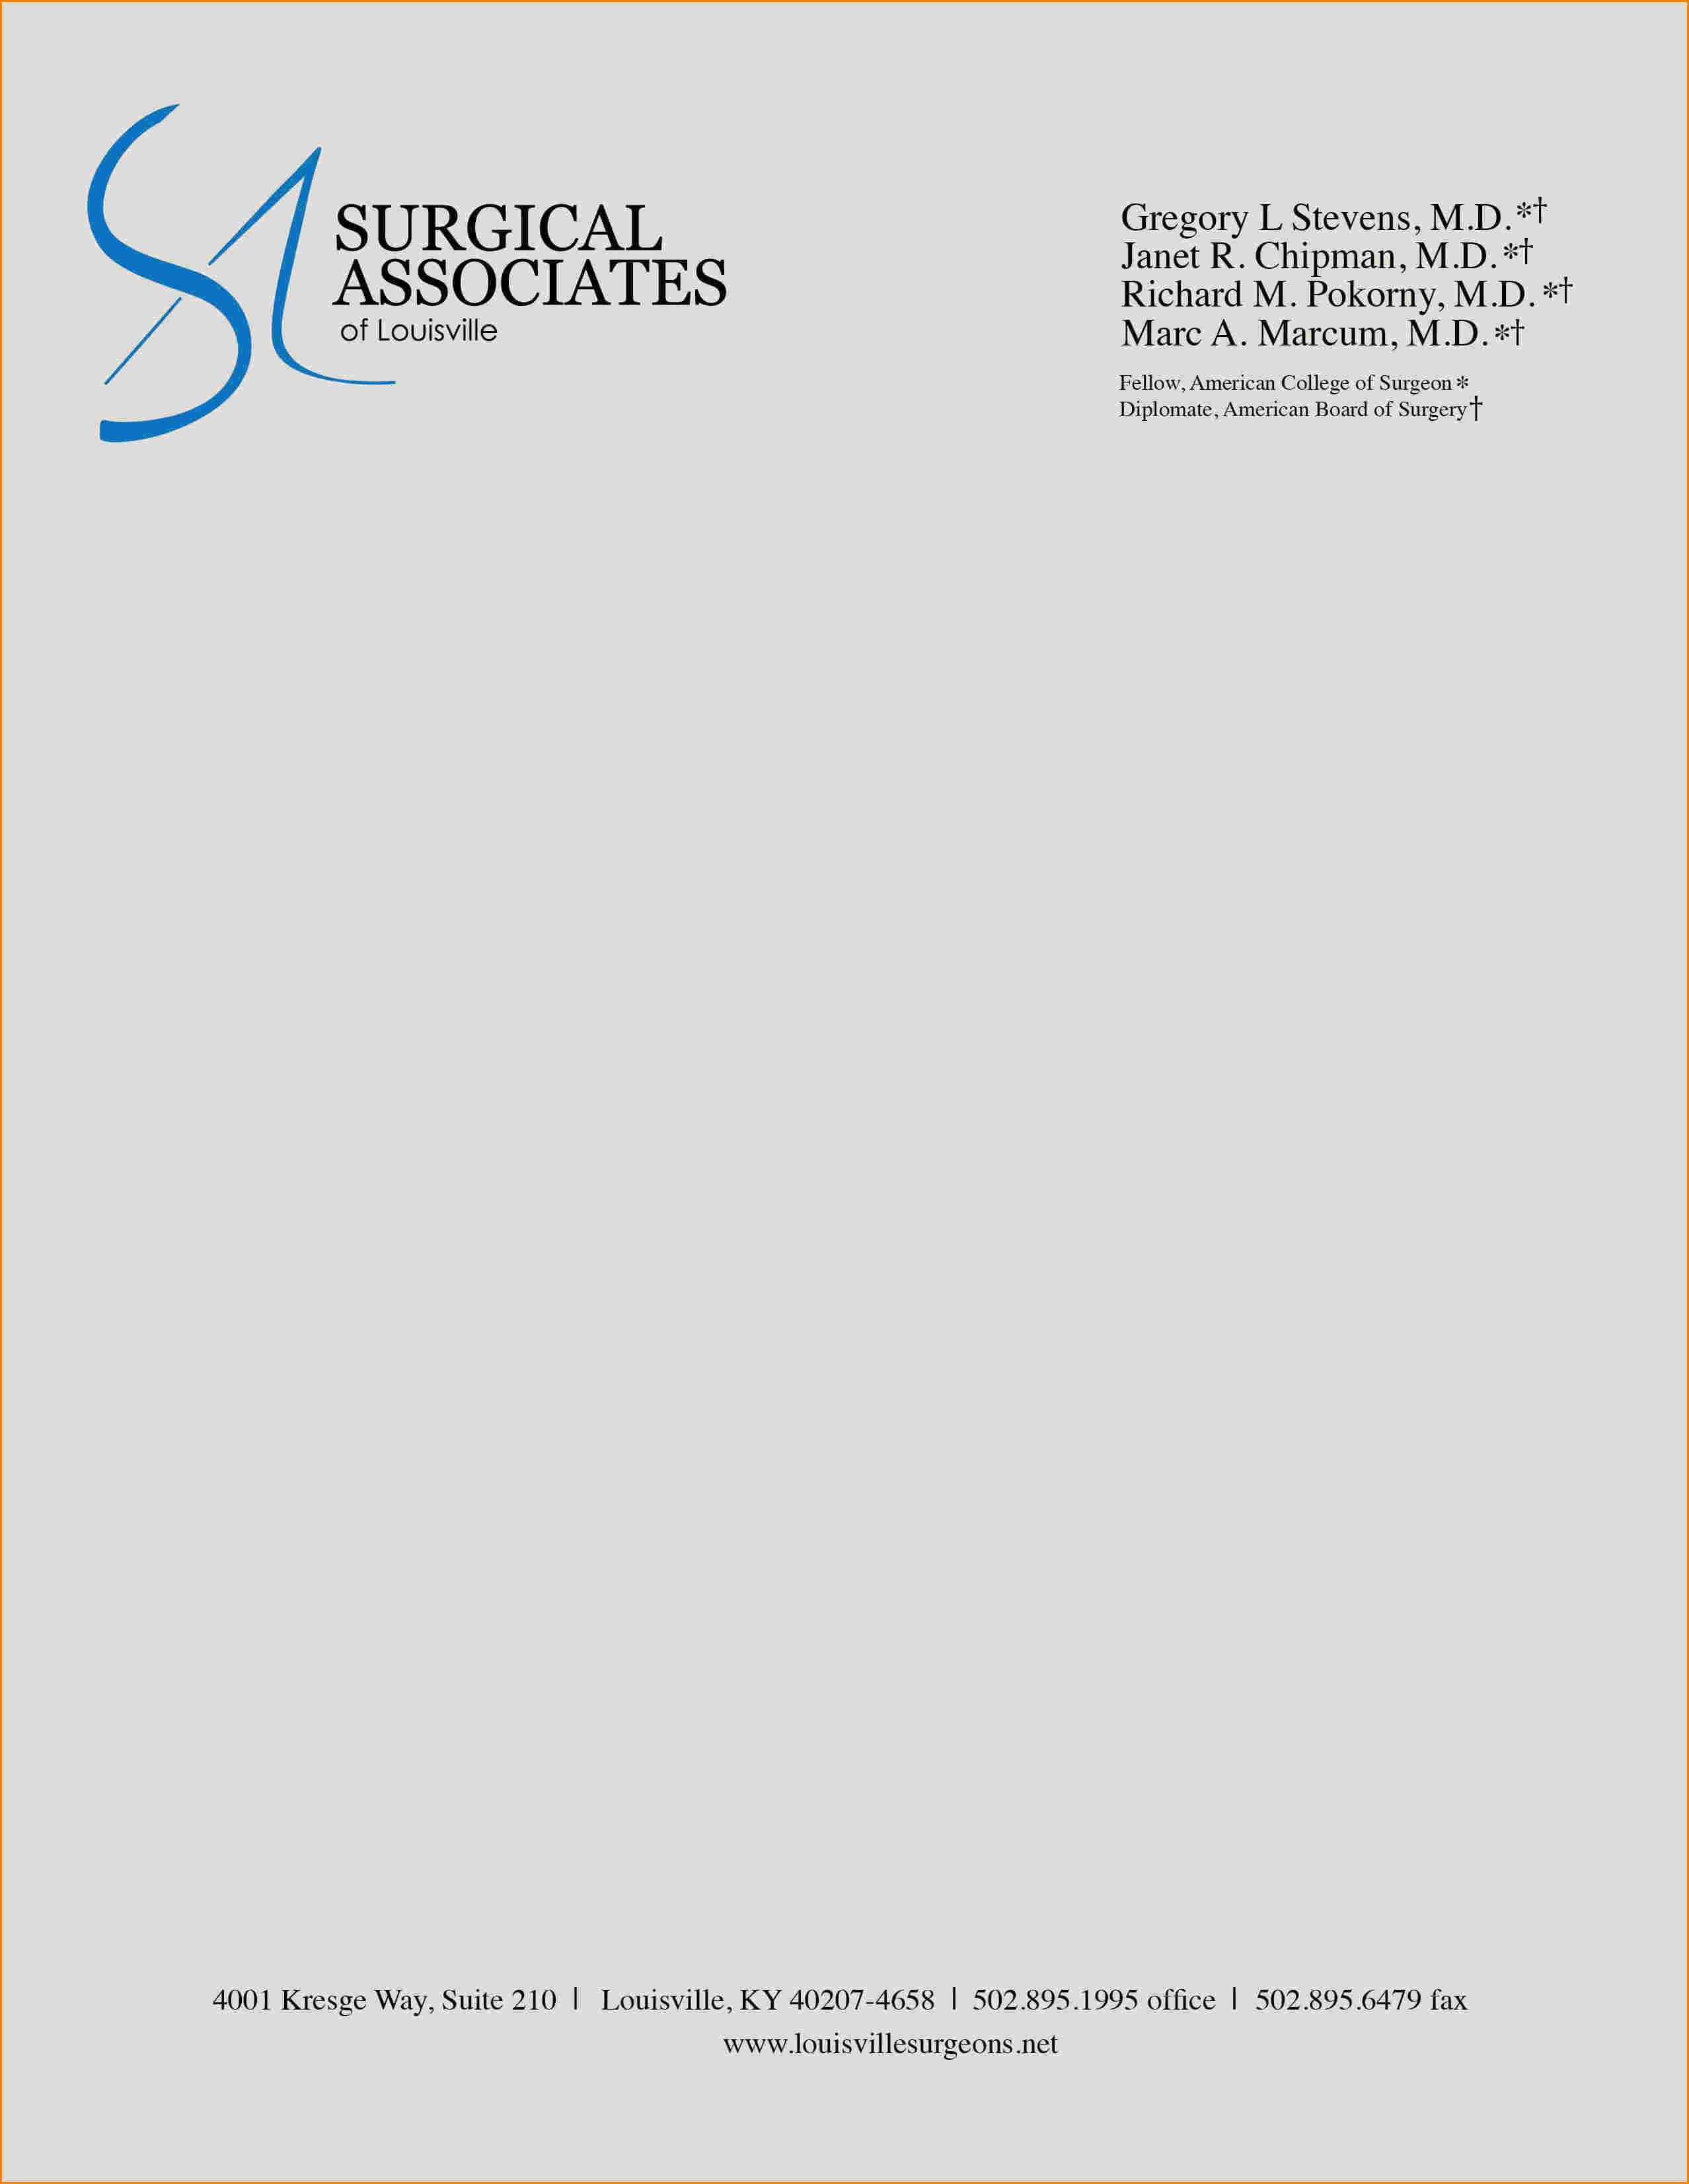 business letterhead examplepany template company example icoxcbmg